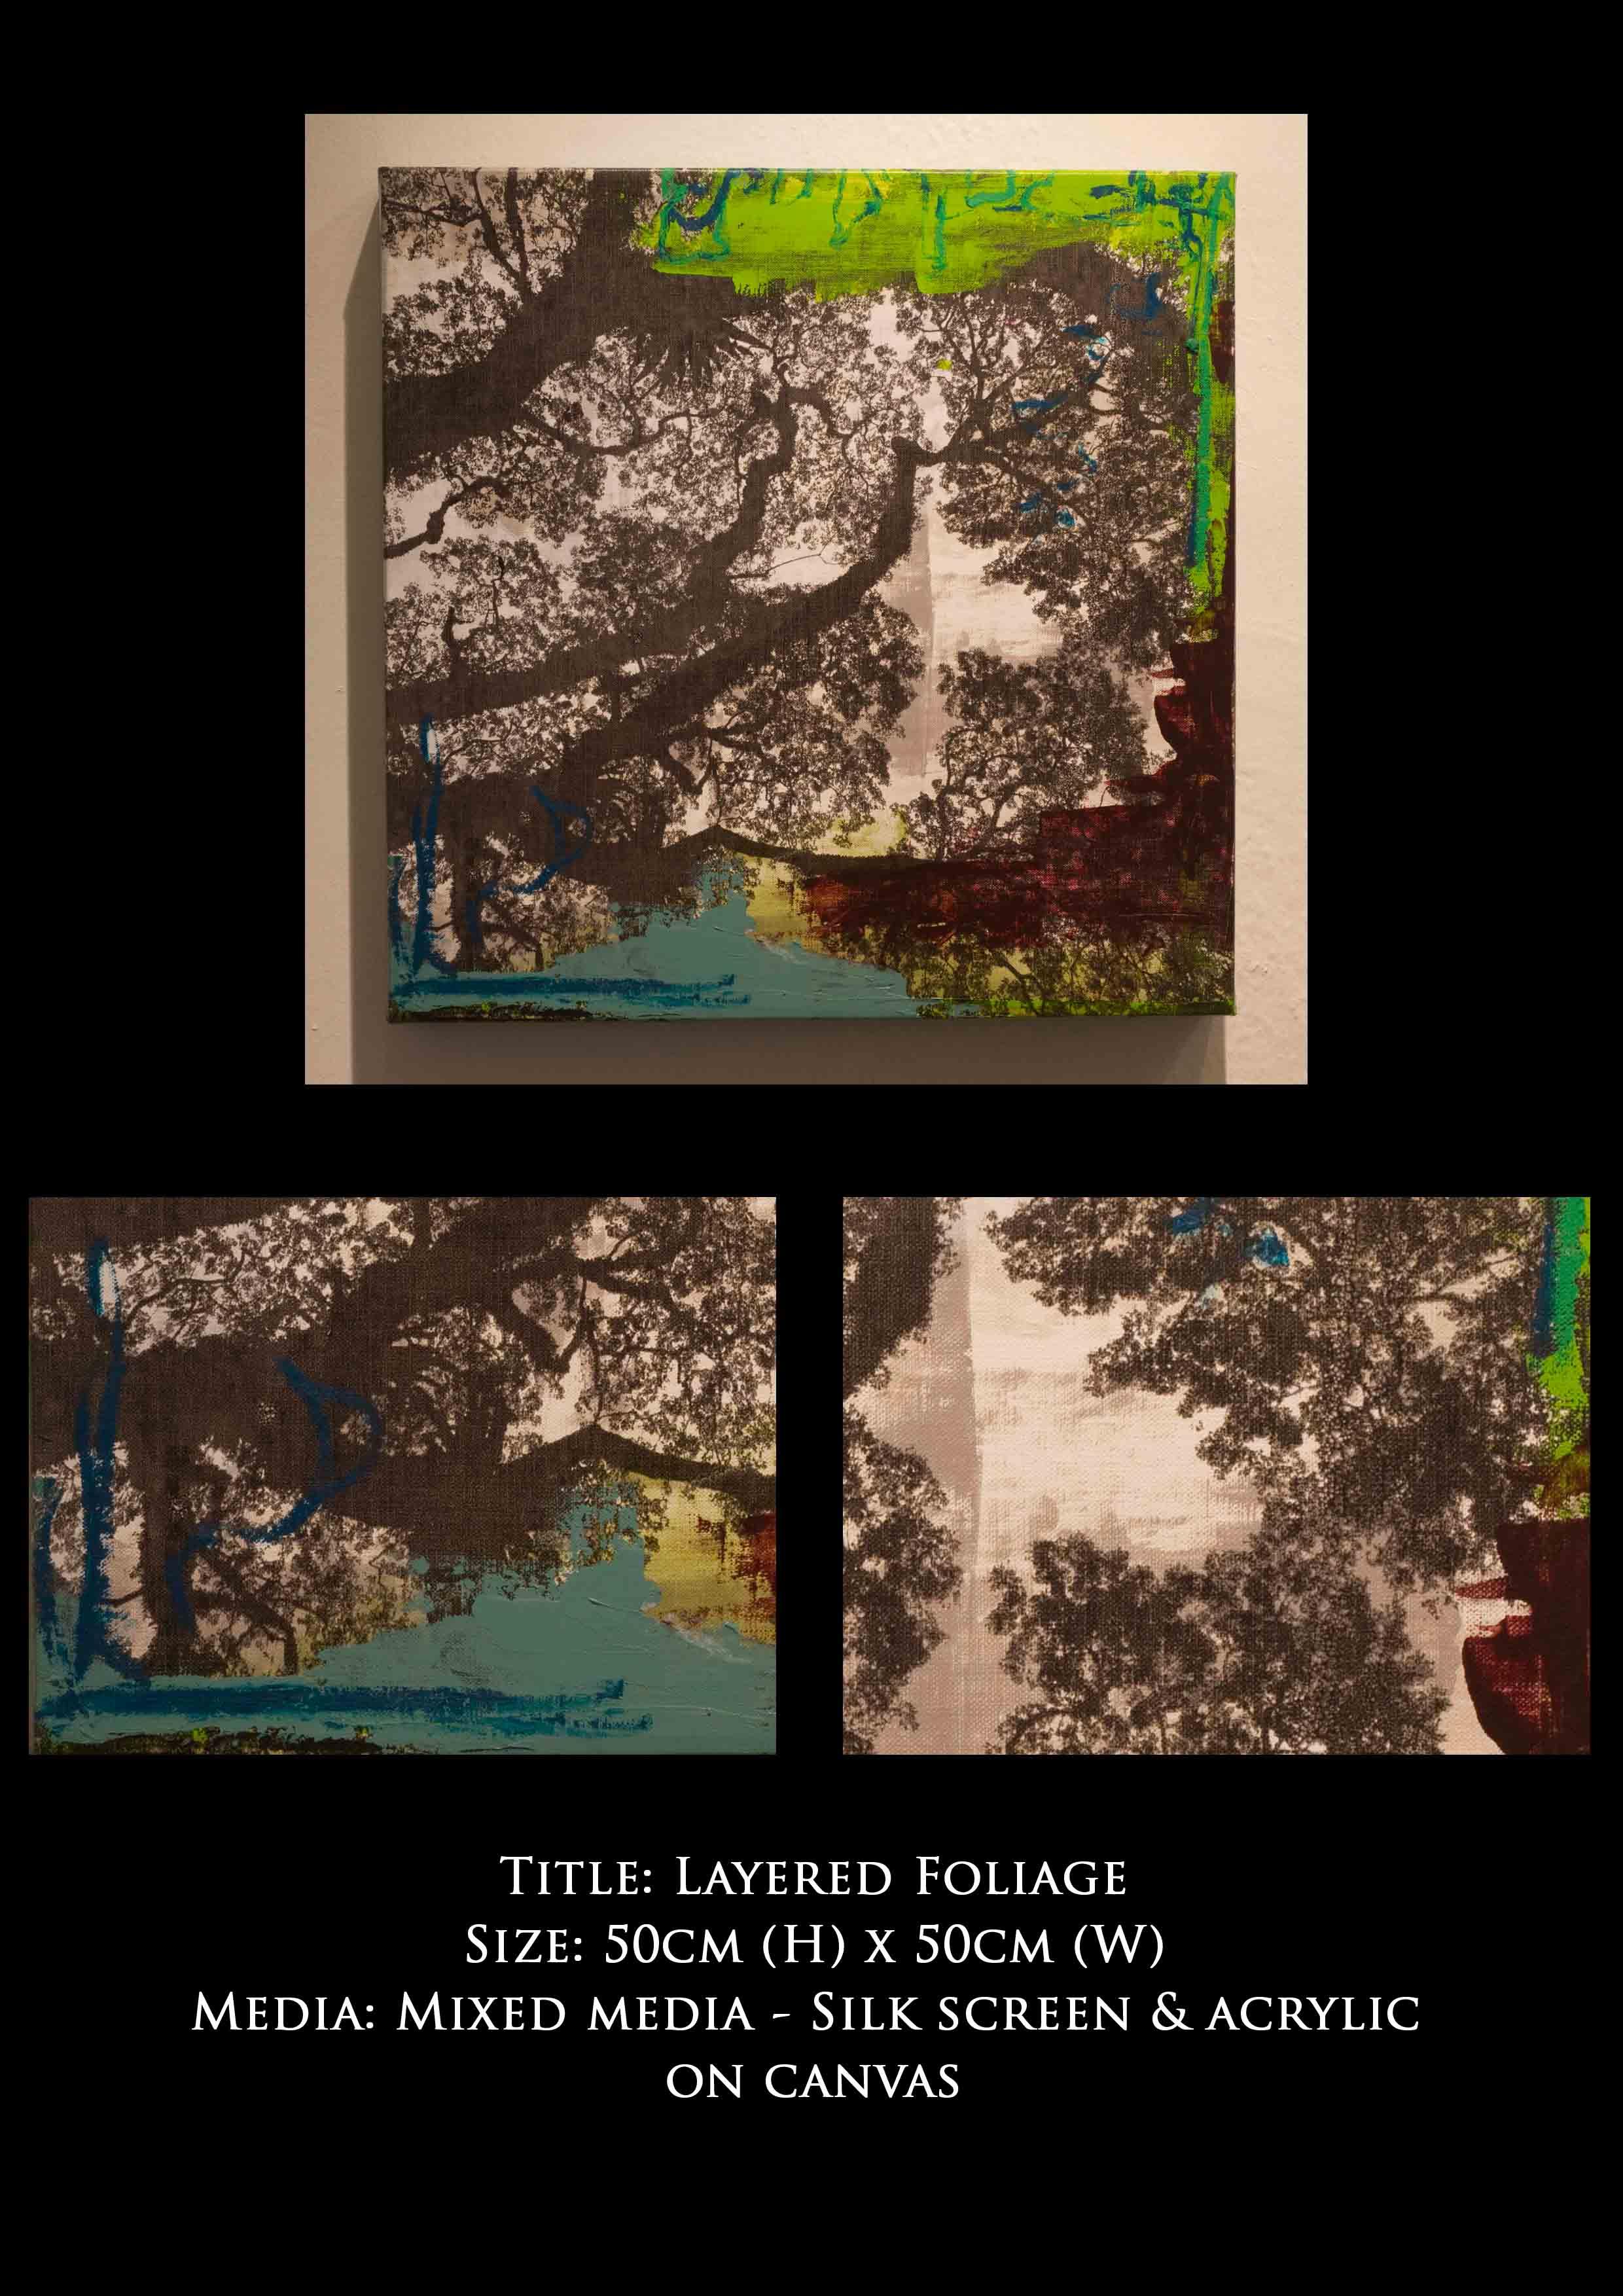 Layered Foliage copy.jpg